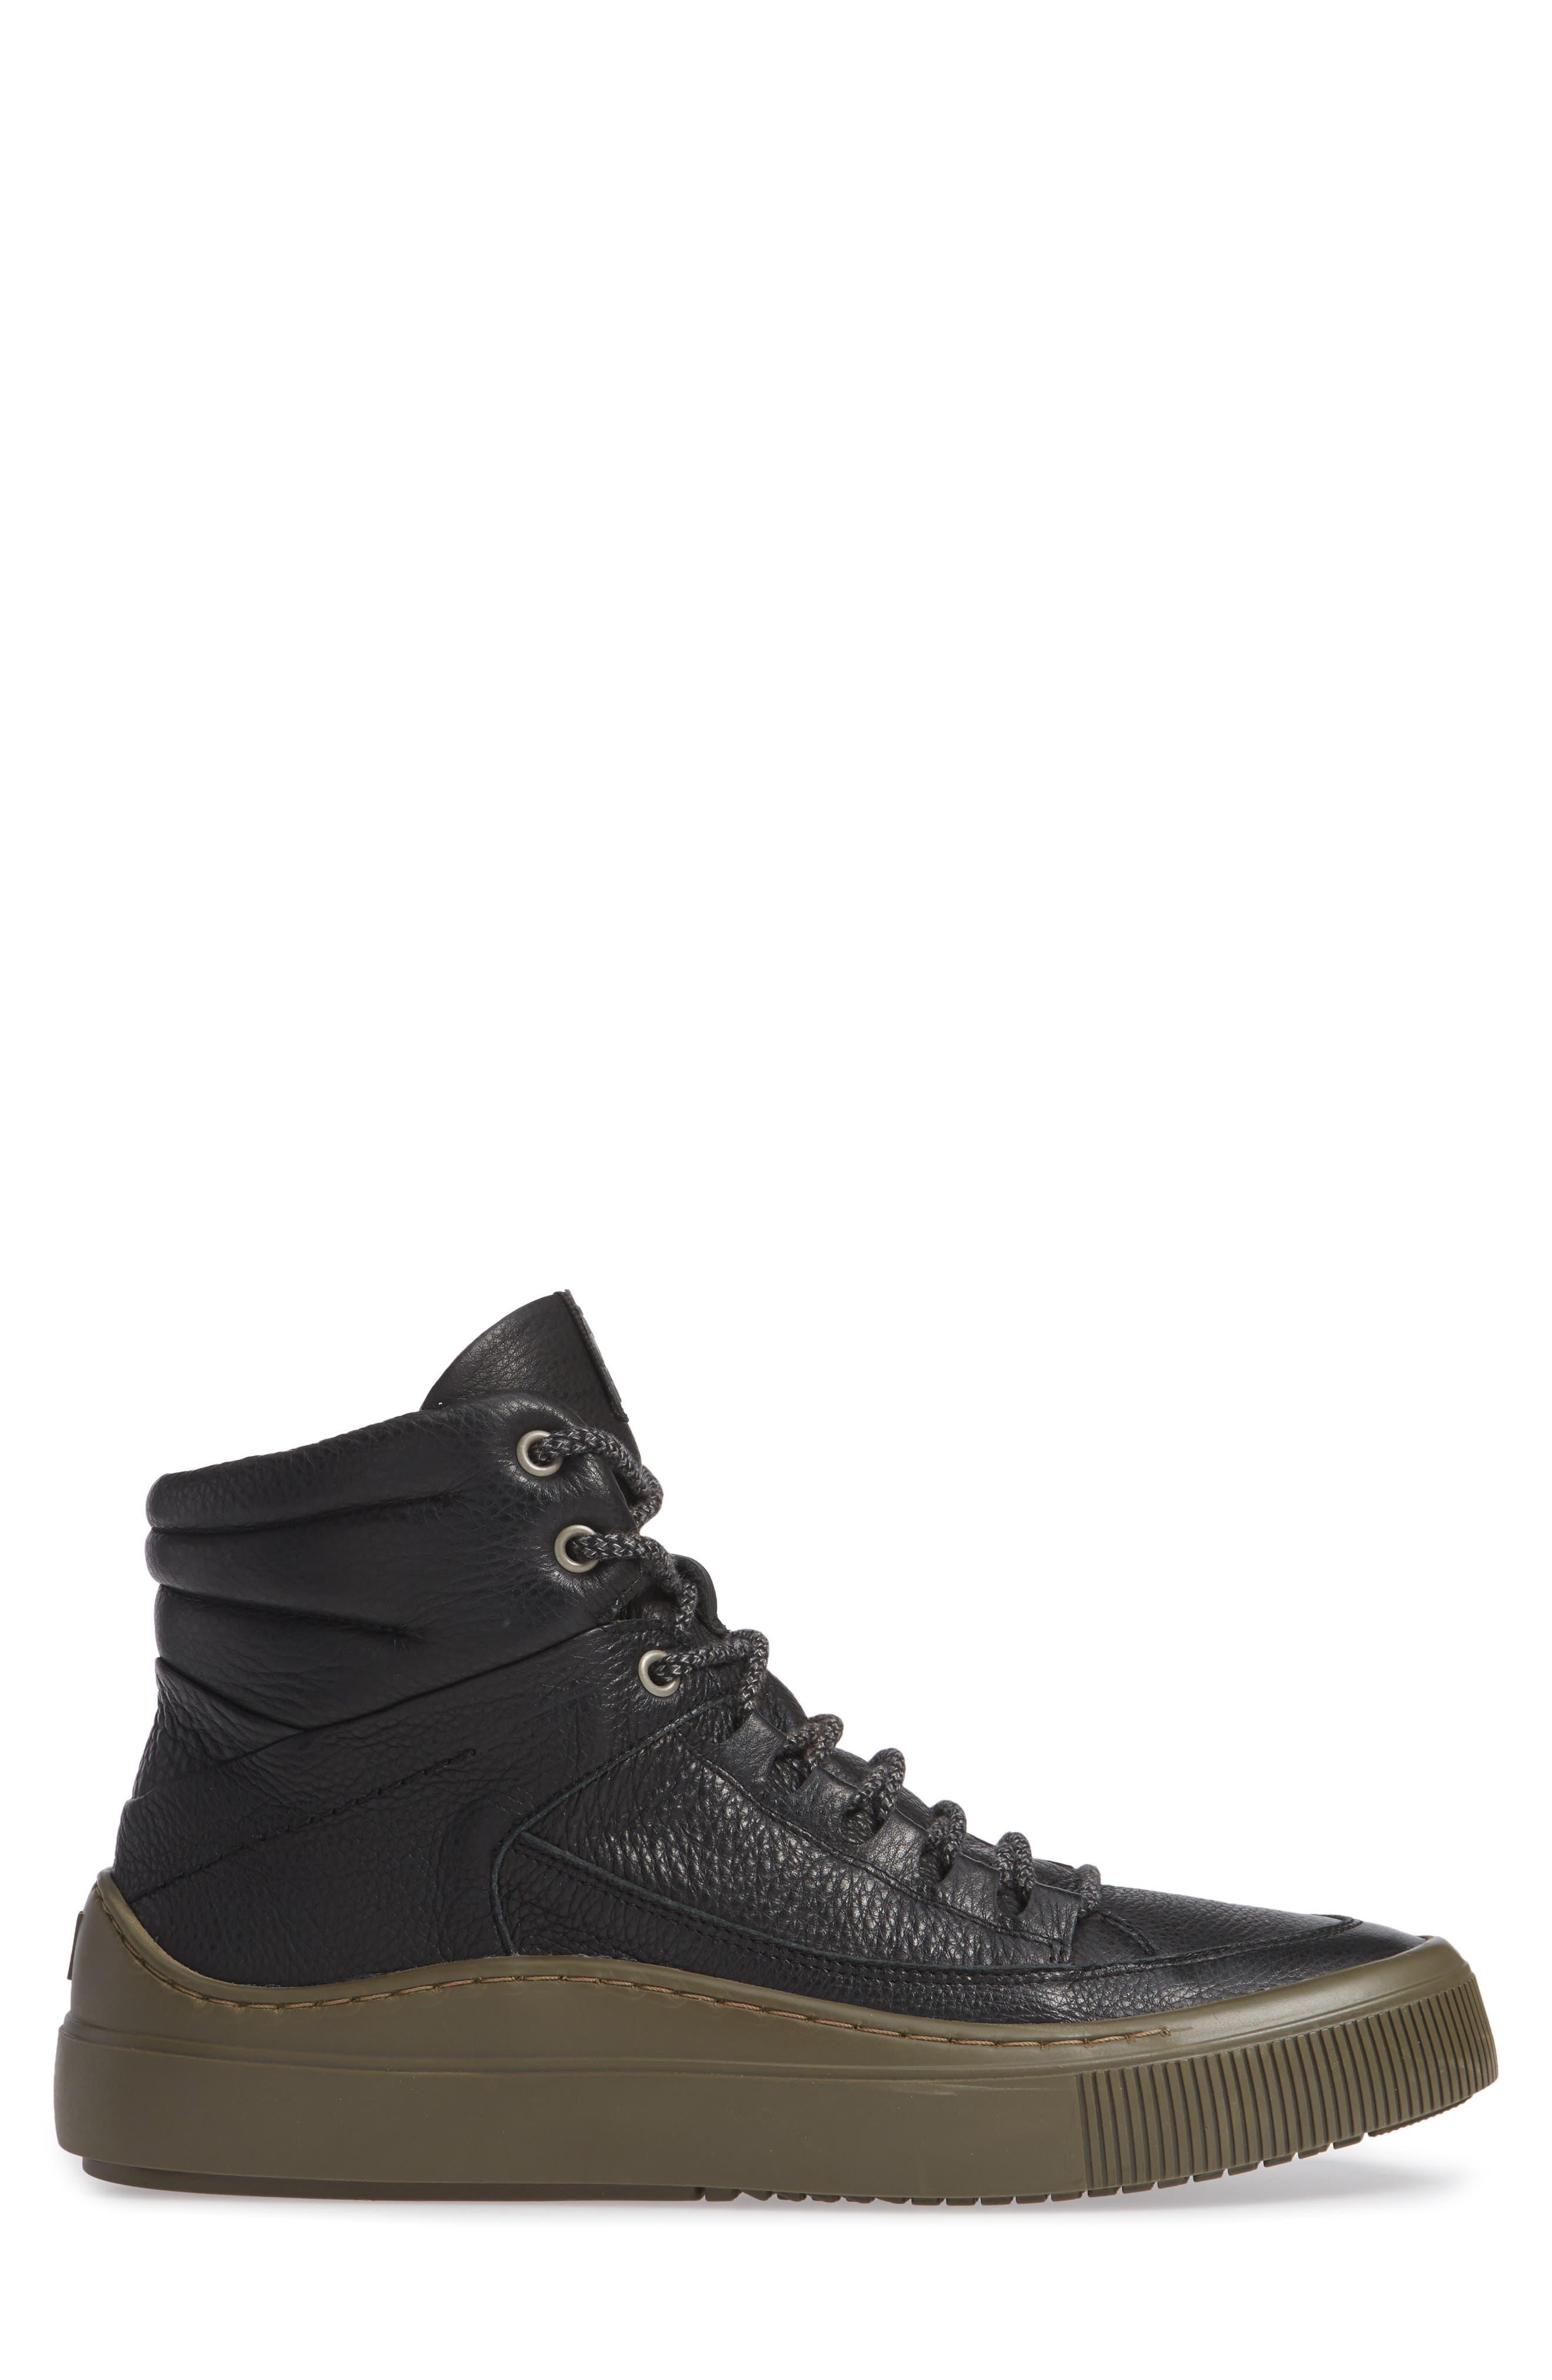 Samu Sneaker,                             Alternate thumbnail 3, color,                             BLACK/ NICOTINE BRITO